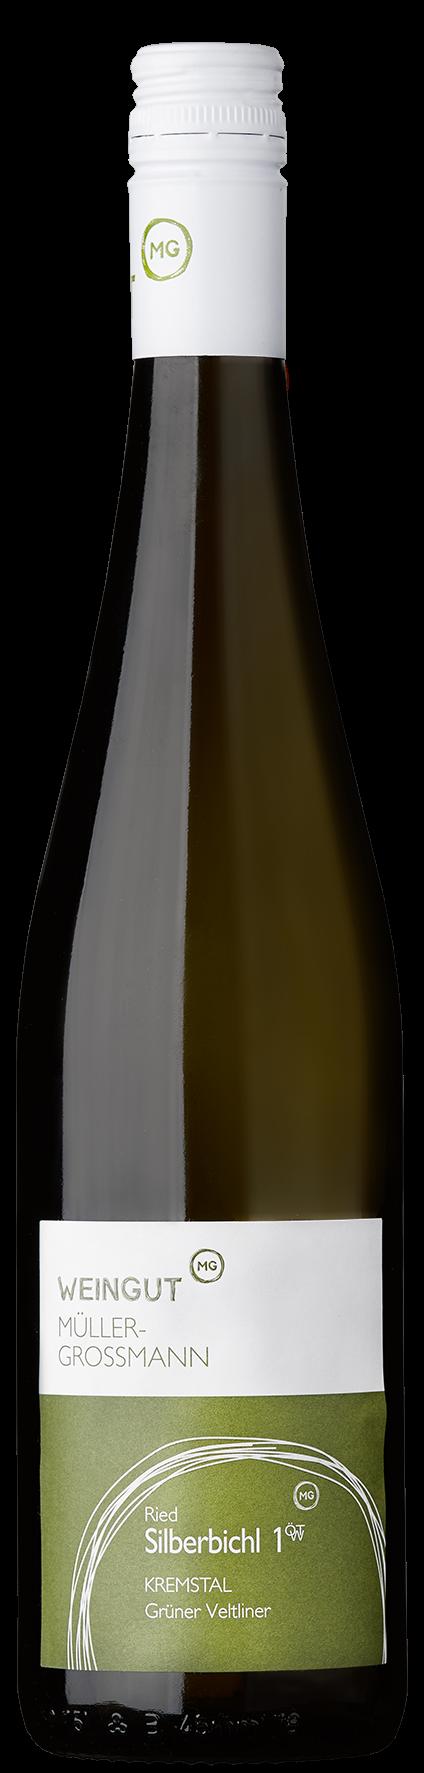 GV – Ried Silberbichl – Kremstal (2)